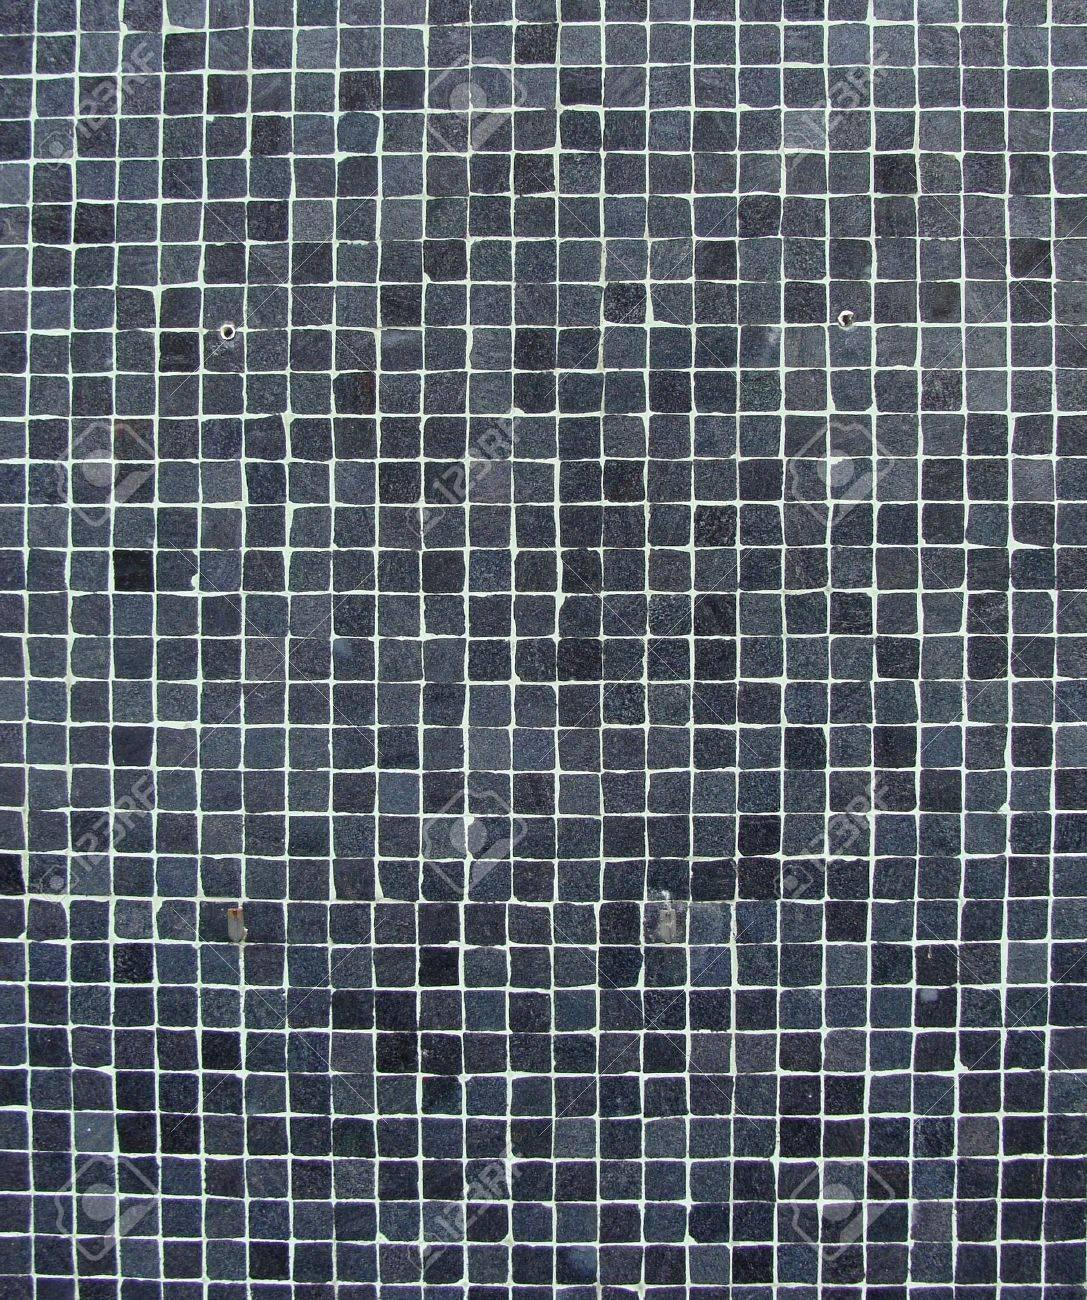 Wand mit blau grau schwarz mosaik fliesen lizenzfreie fotos ...